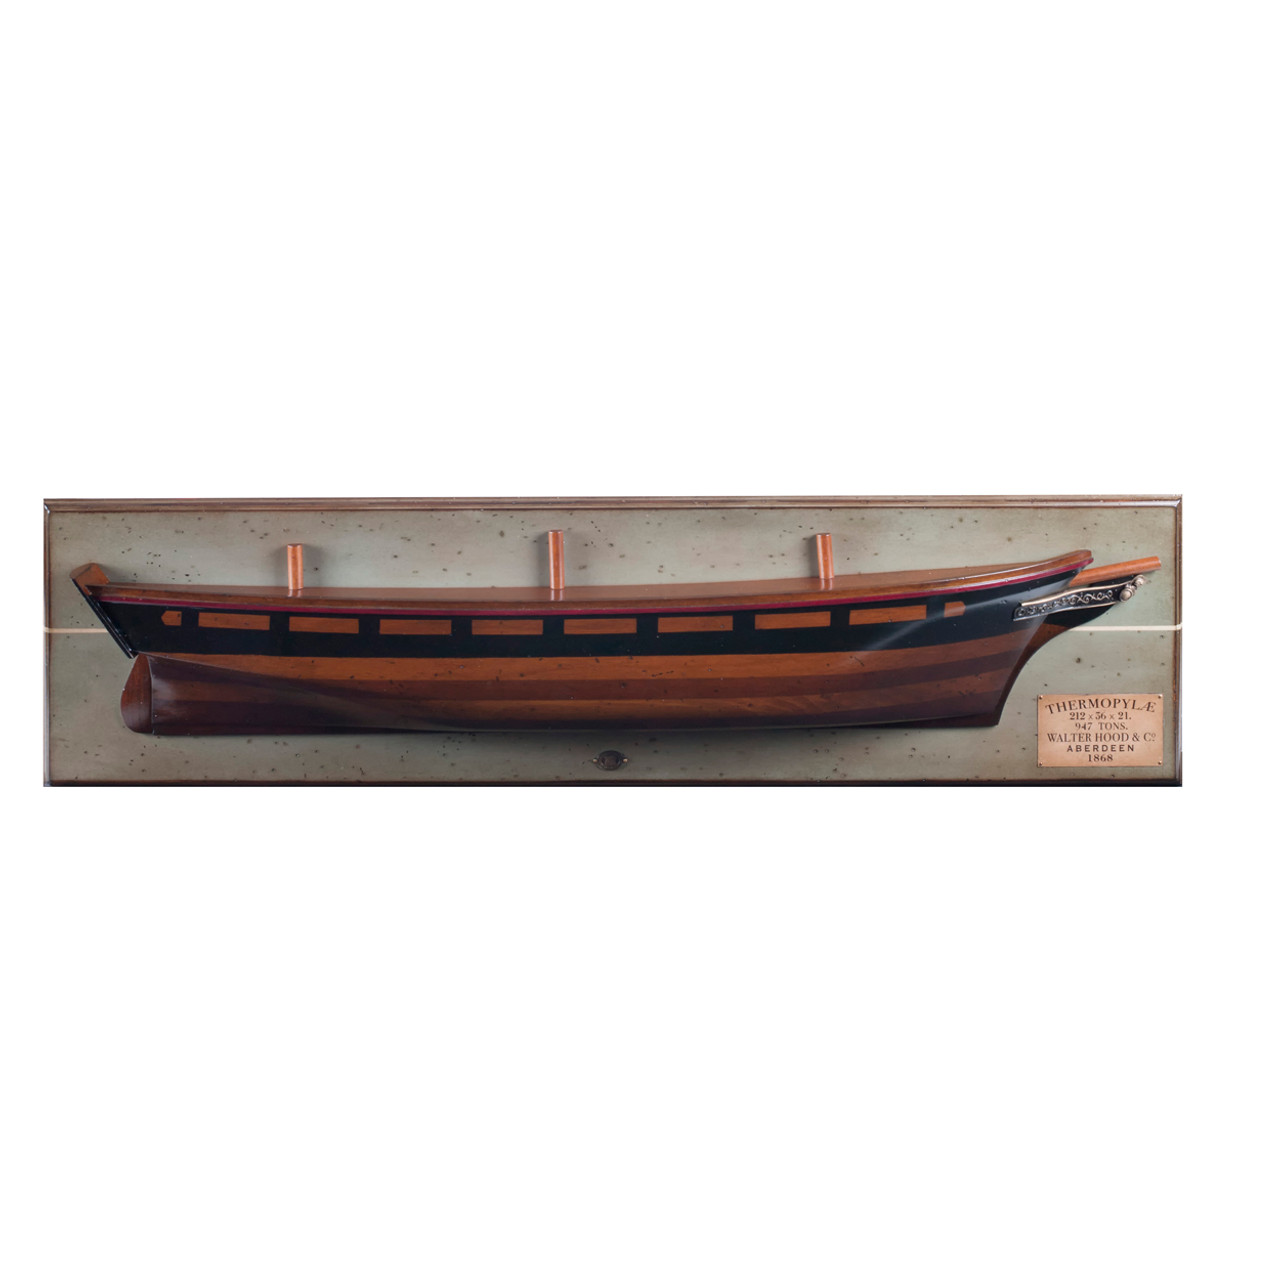 Thermopylae 1868 Clipper Ship Wooden Half Hull Model